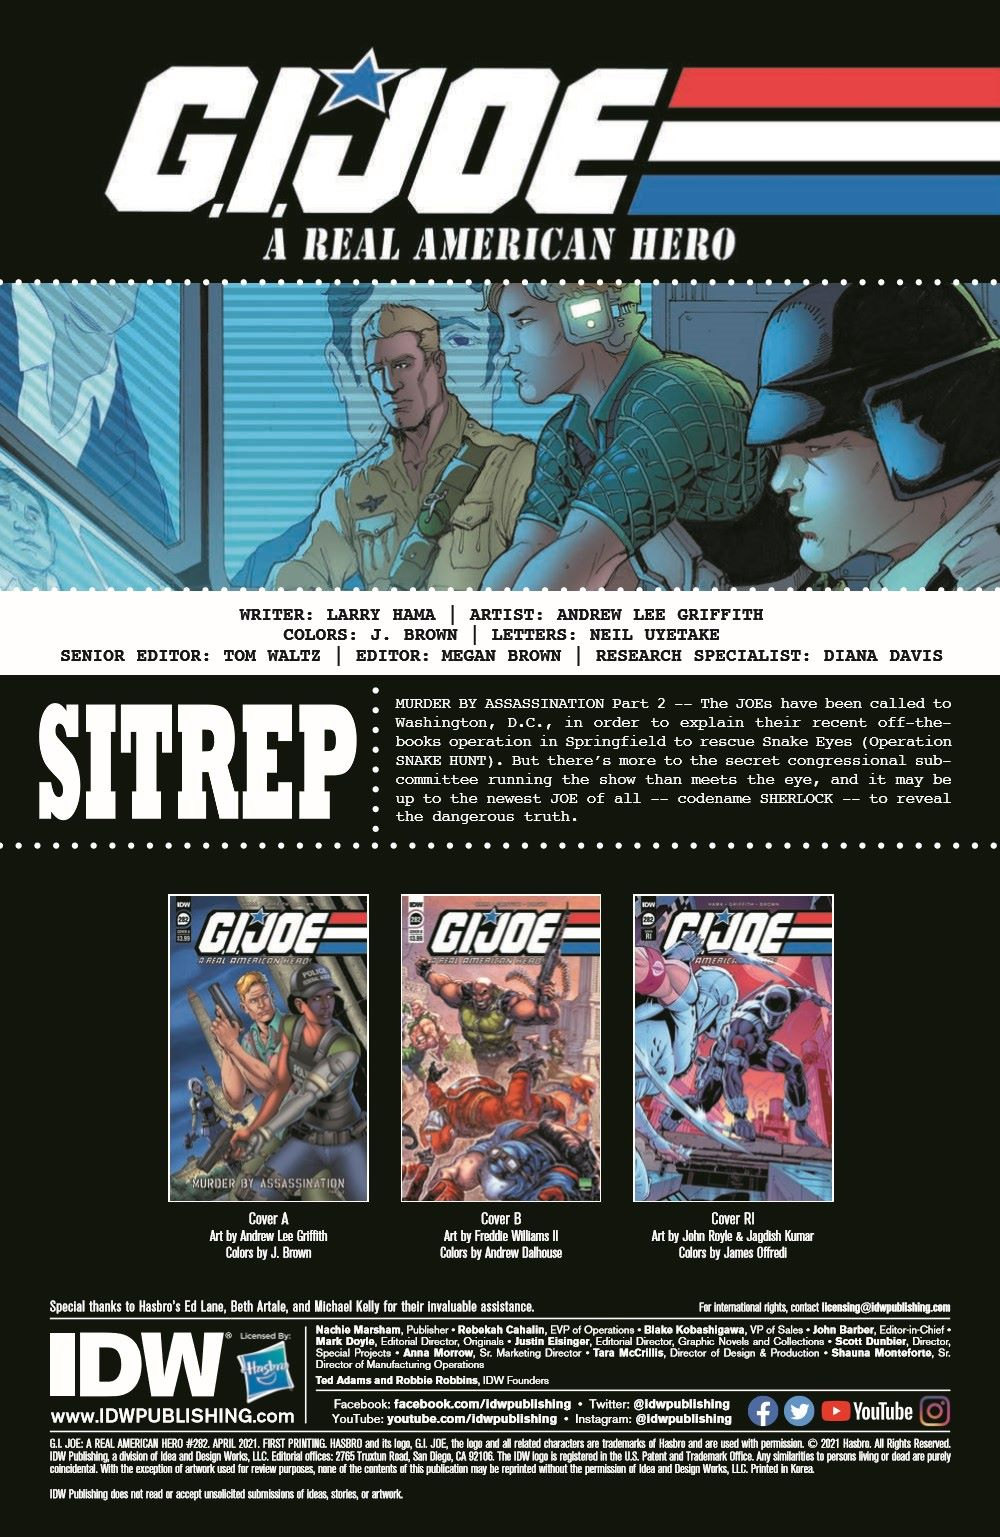 GIJoeRAH282-pr-2 ComicList Previews: G.I. JOE A REAL AMERICAN HERO #282